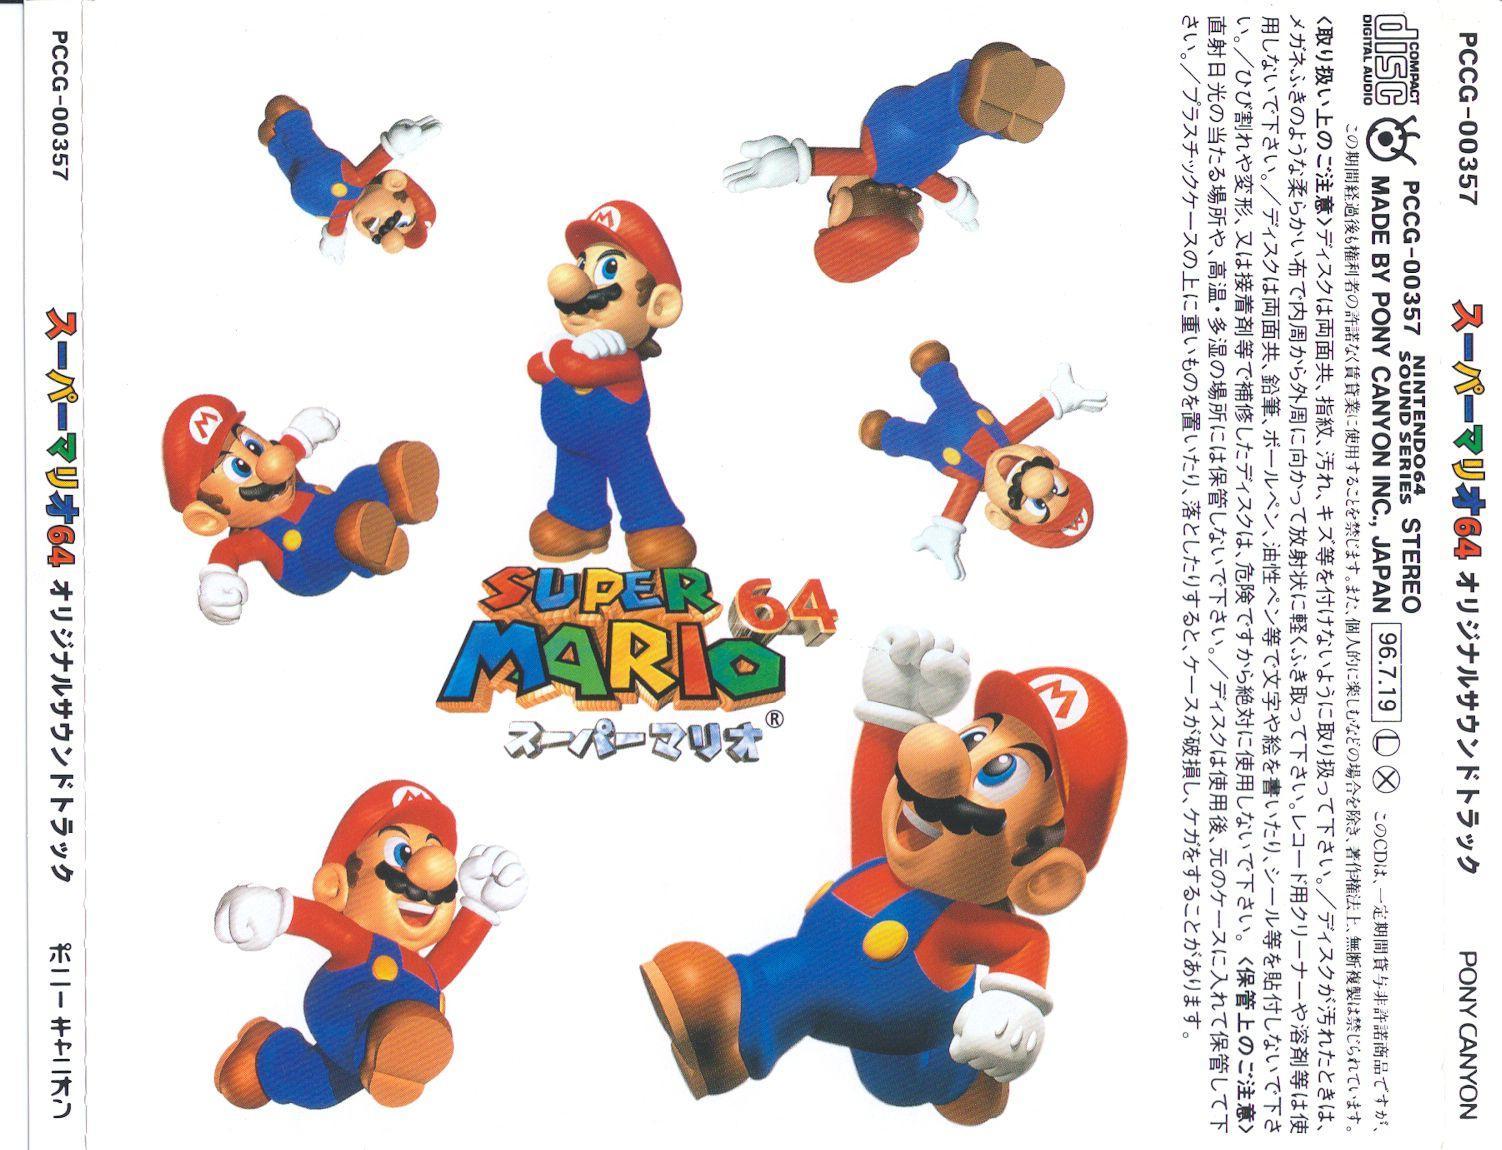 Super Mario 64 Original Sound Track  Soundtrack from Super